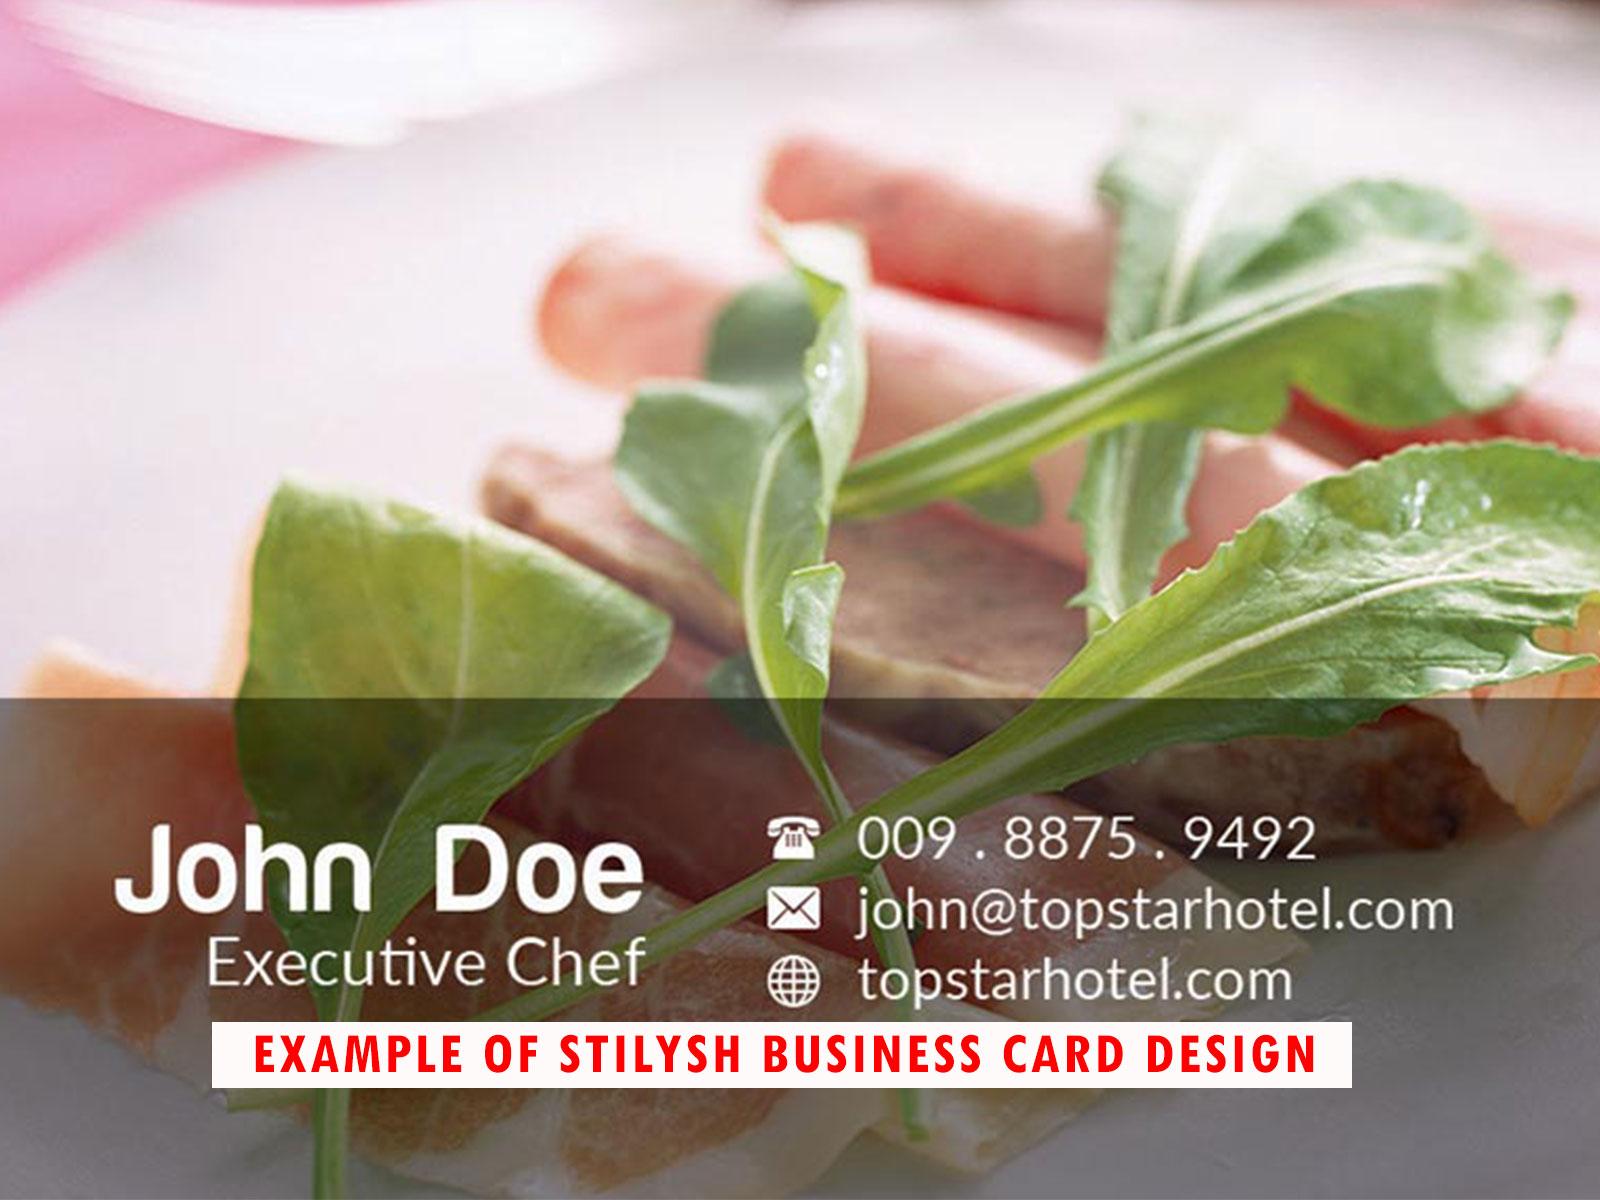 Web Design, Logo, Brochure, Flyer, Video Editing, WordPress, Web App